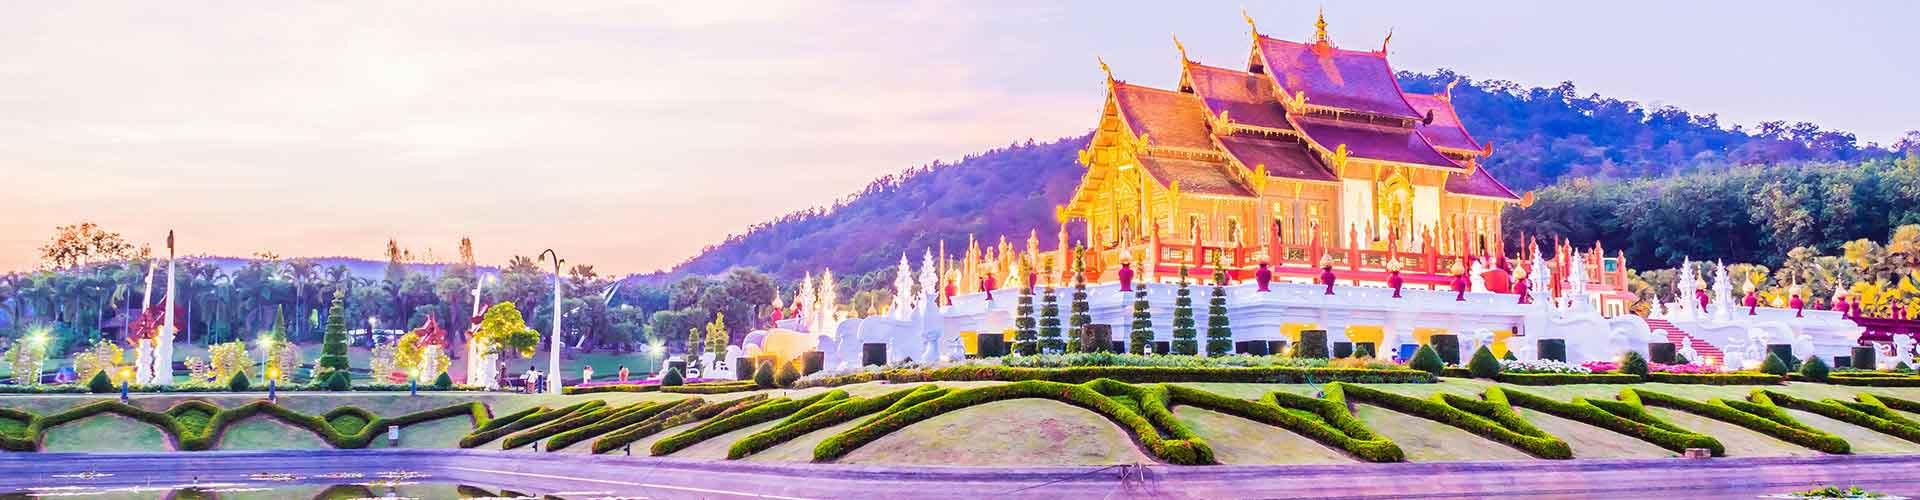 Chiang Mai – Hostels in Chiang Mai. Chiang Mai auf der Karte. Fotos und Bewertungen für jedes Hostel in Chiang Mai.